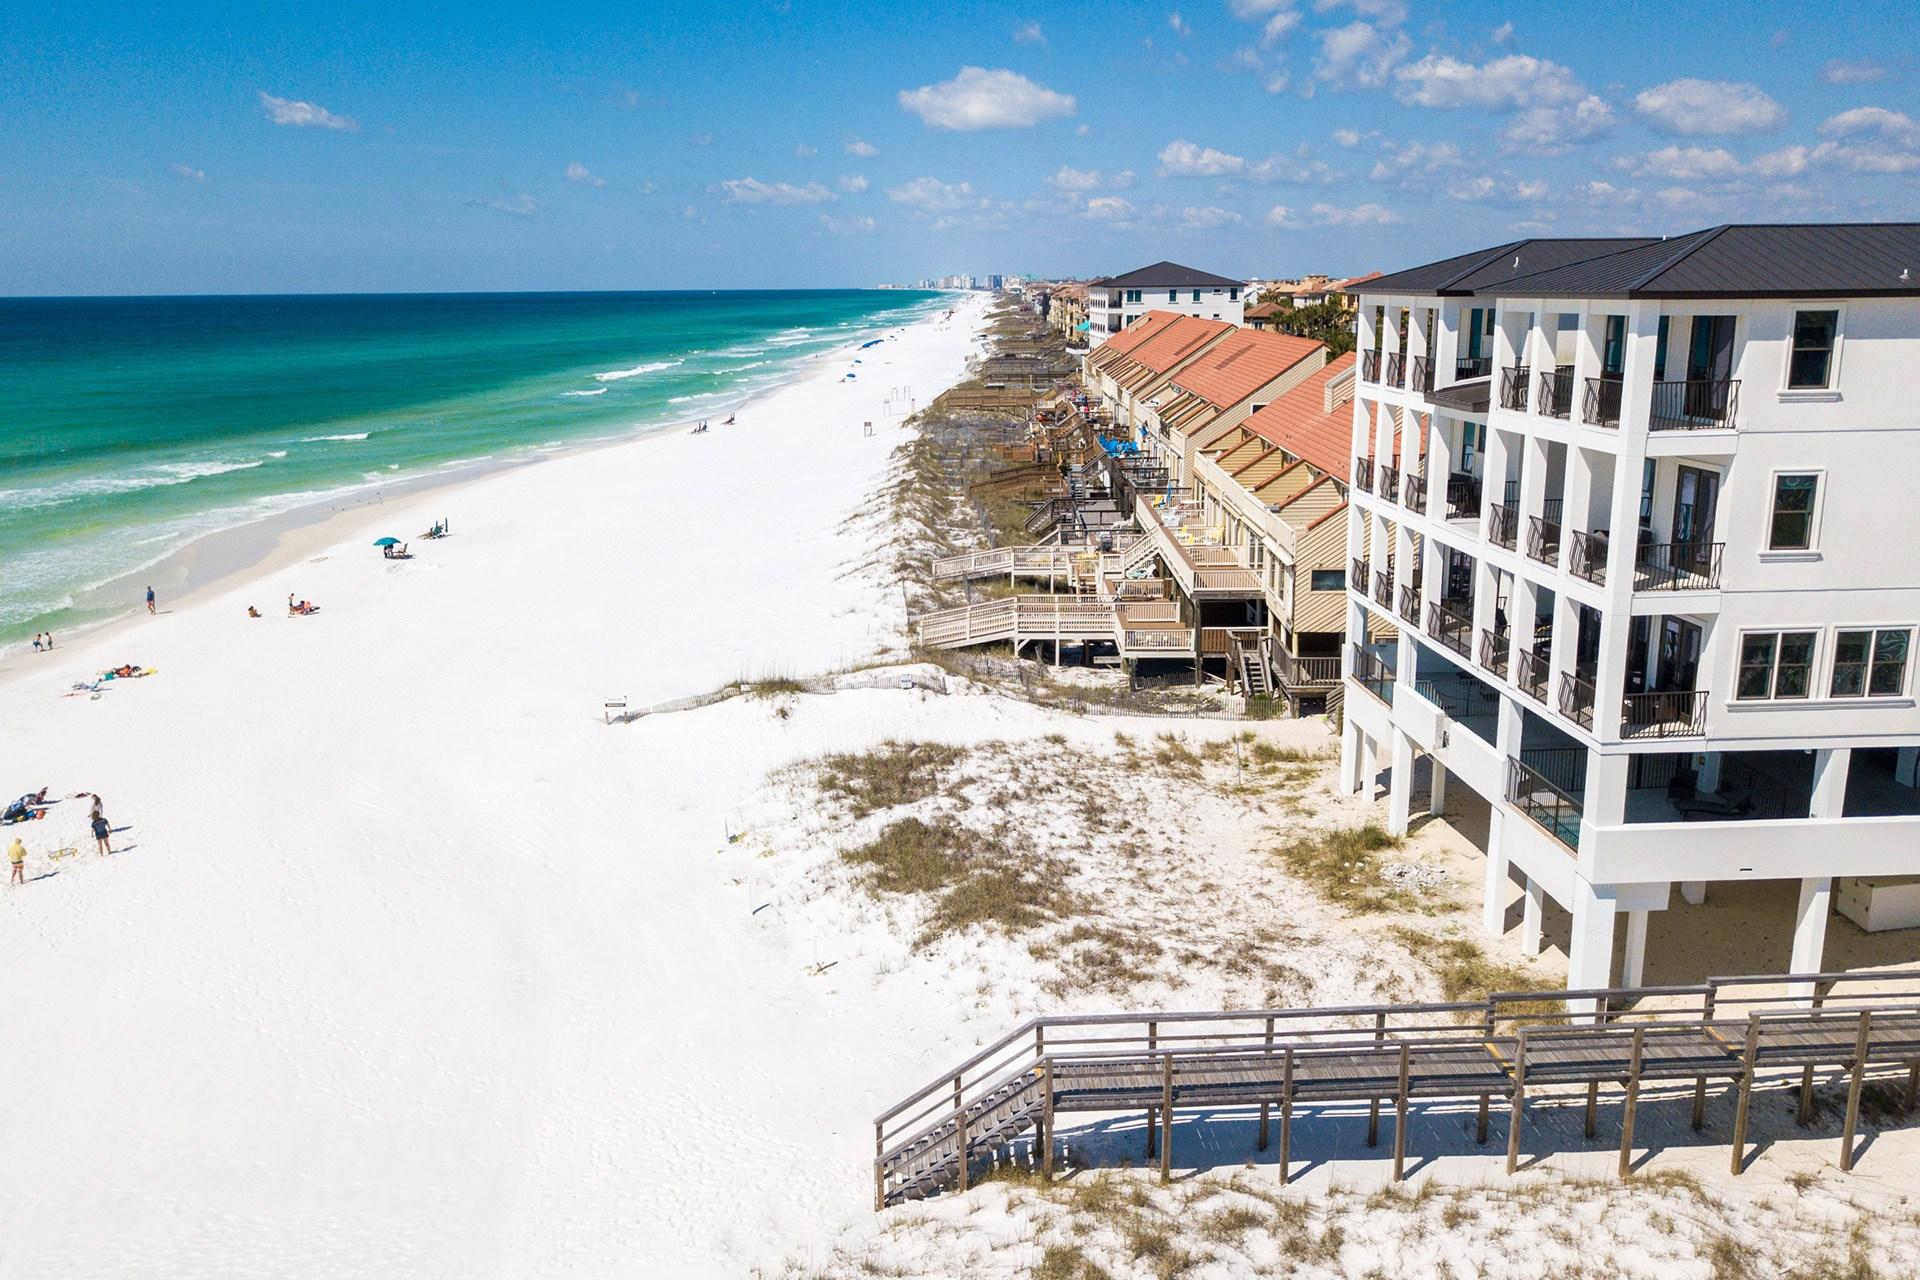 Map Isle Destin Florida Condos Holiday - Map Of Destin Florida Condos